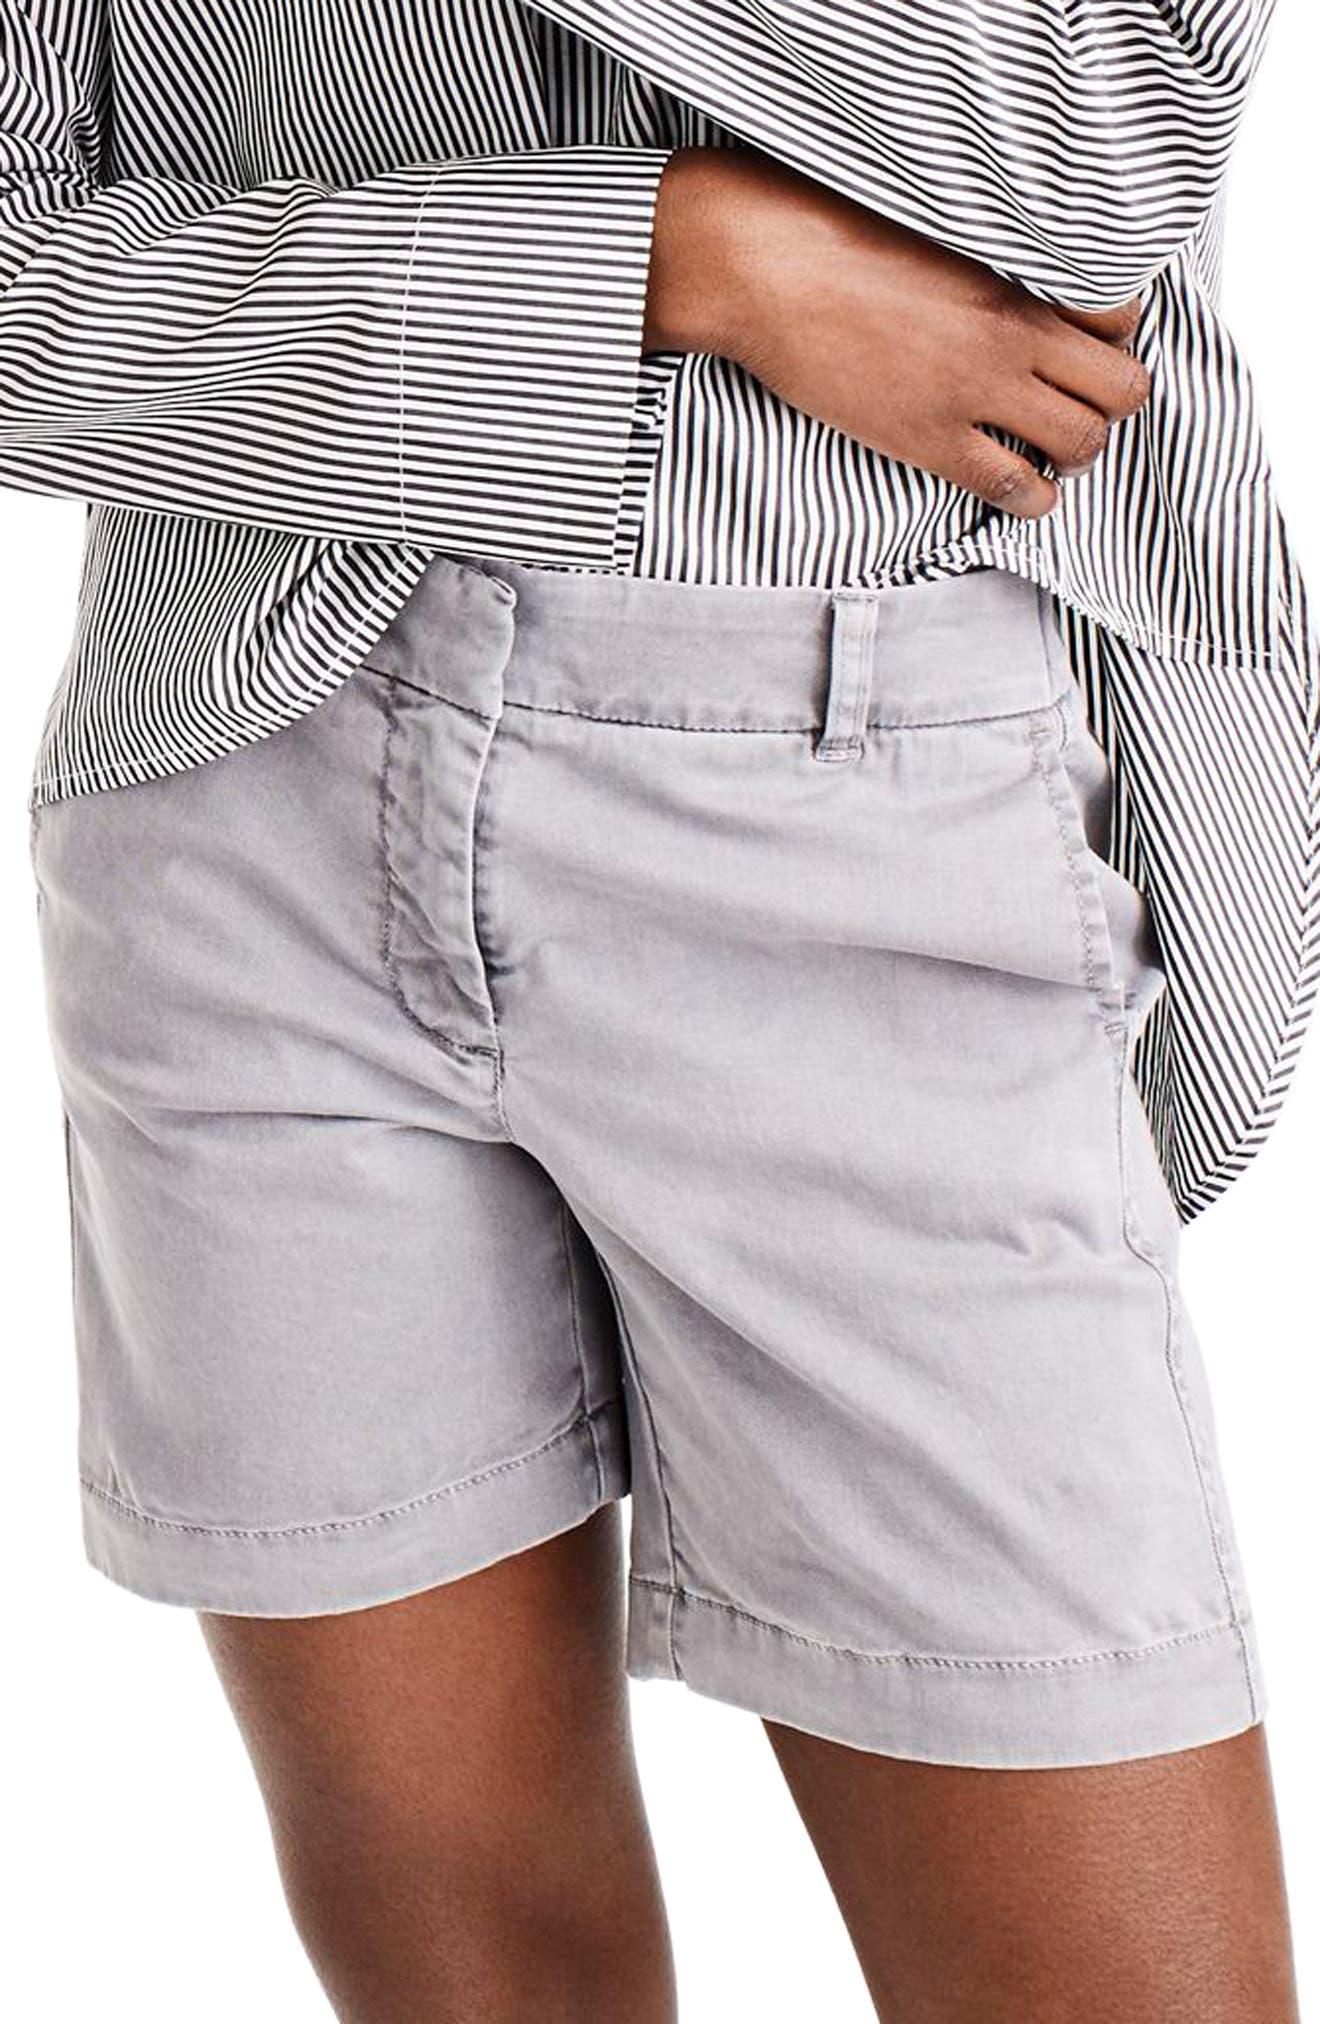 Stretch Cotton Chino Shorts,                             Main thumbnail 1, color,                             020